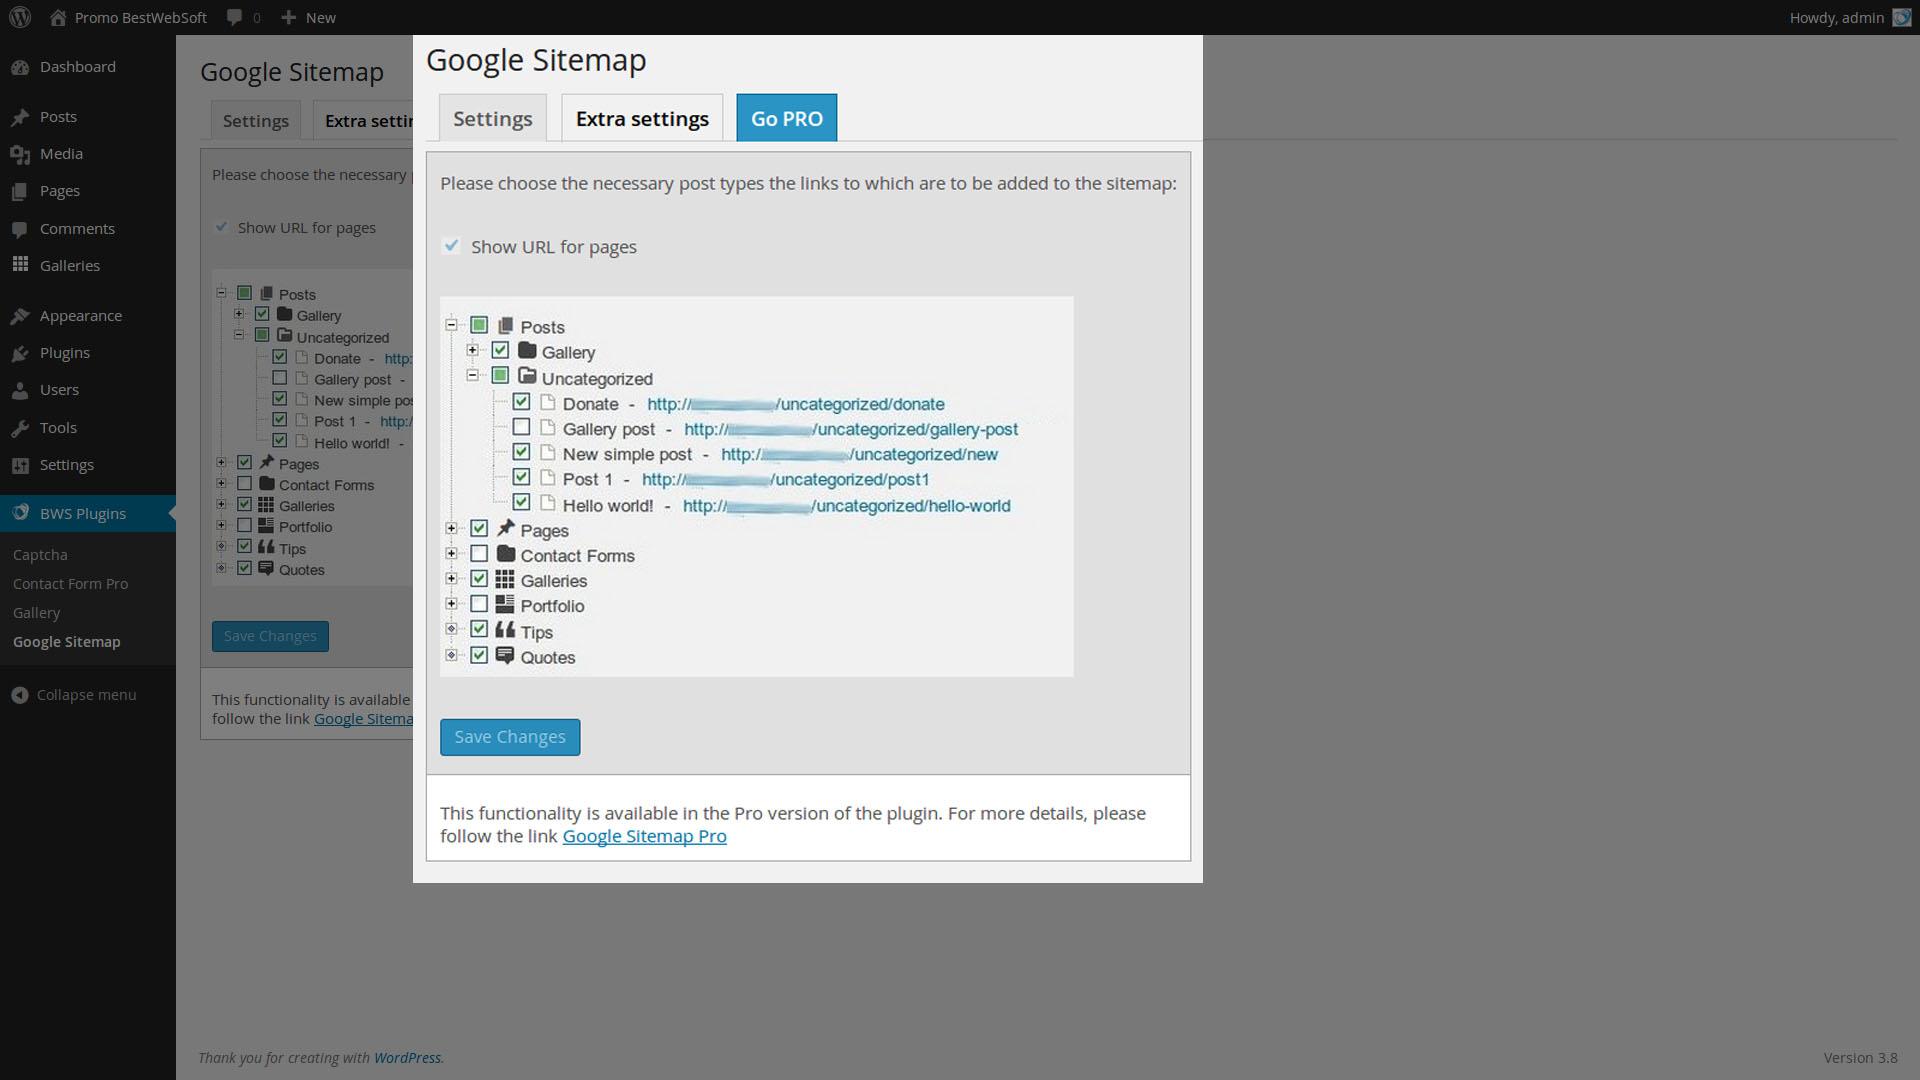 Google Sitemap Extra Settings